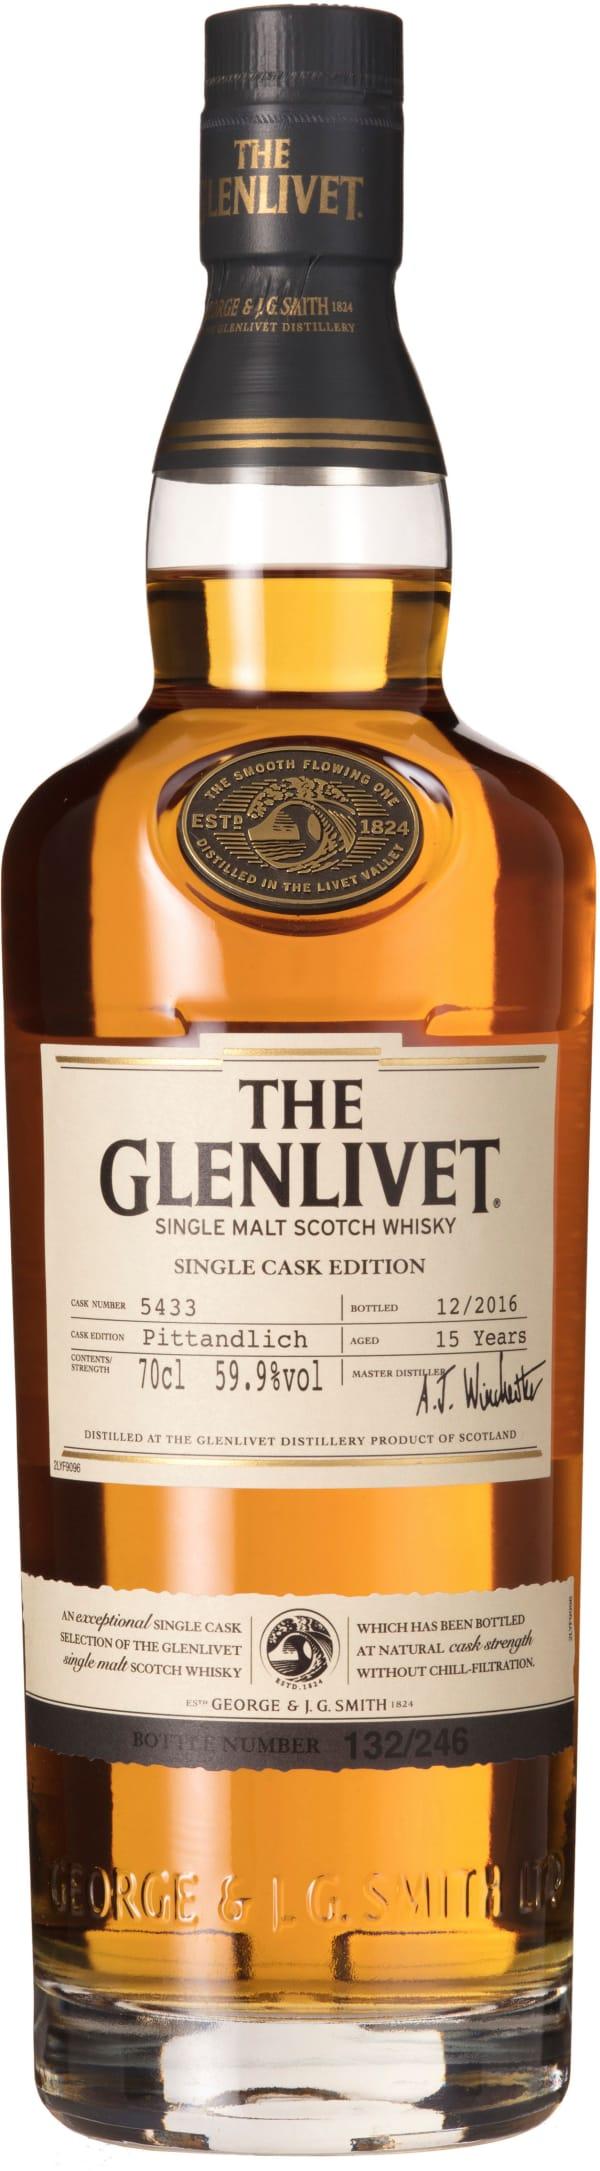 The Glenlivet Pittandlich Single Cask Edition Single Malt